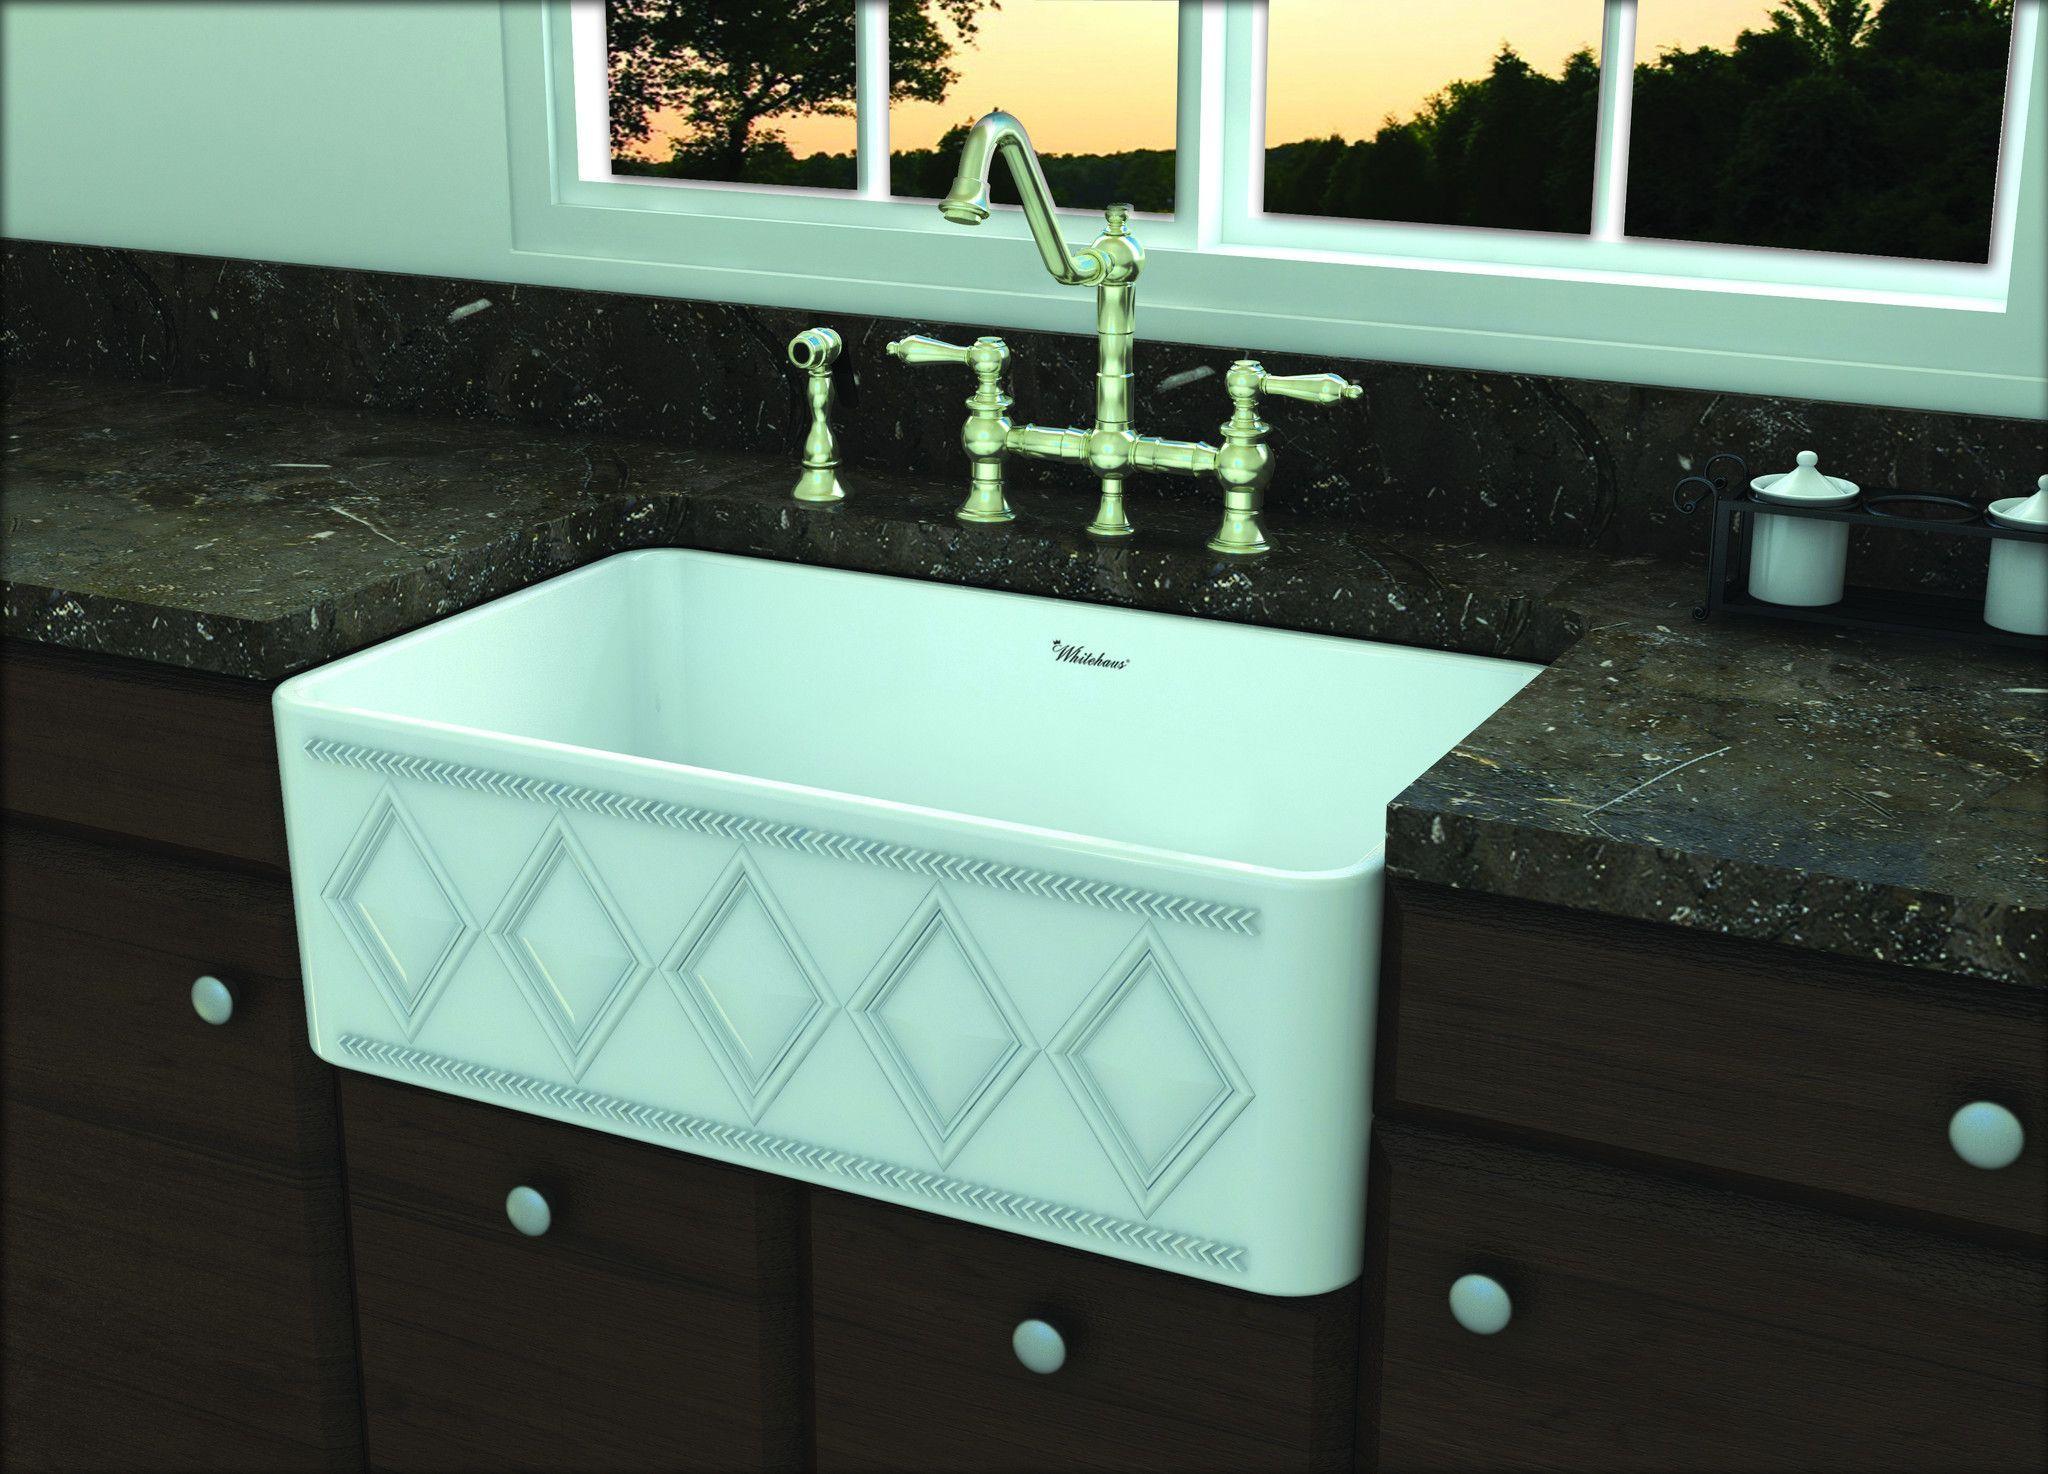 Whitehaus Diamondhaus Reversible Series fireclay sink -White ...